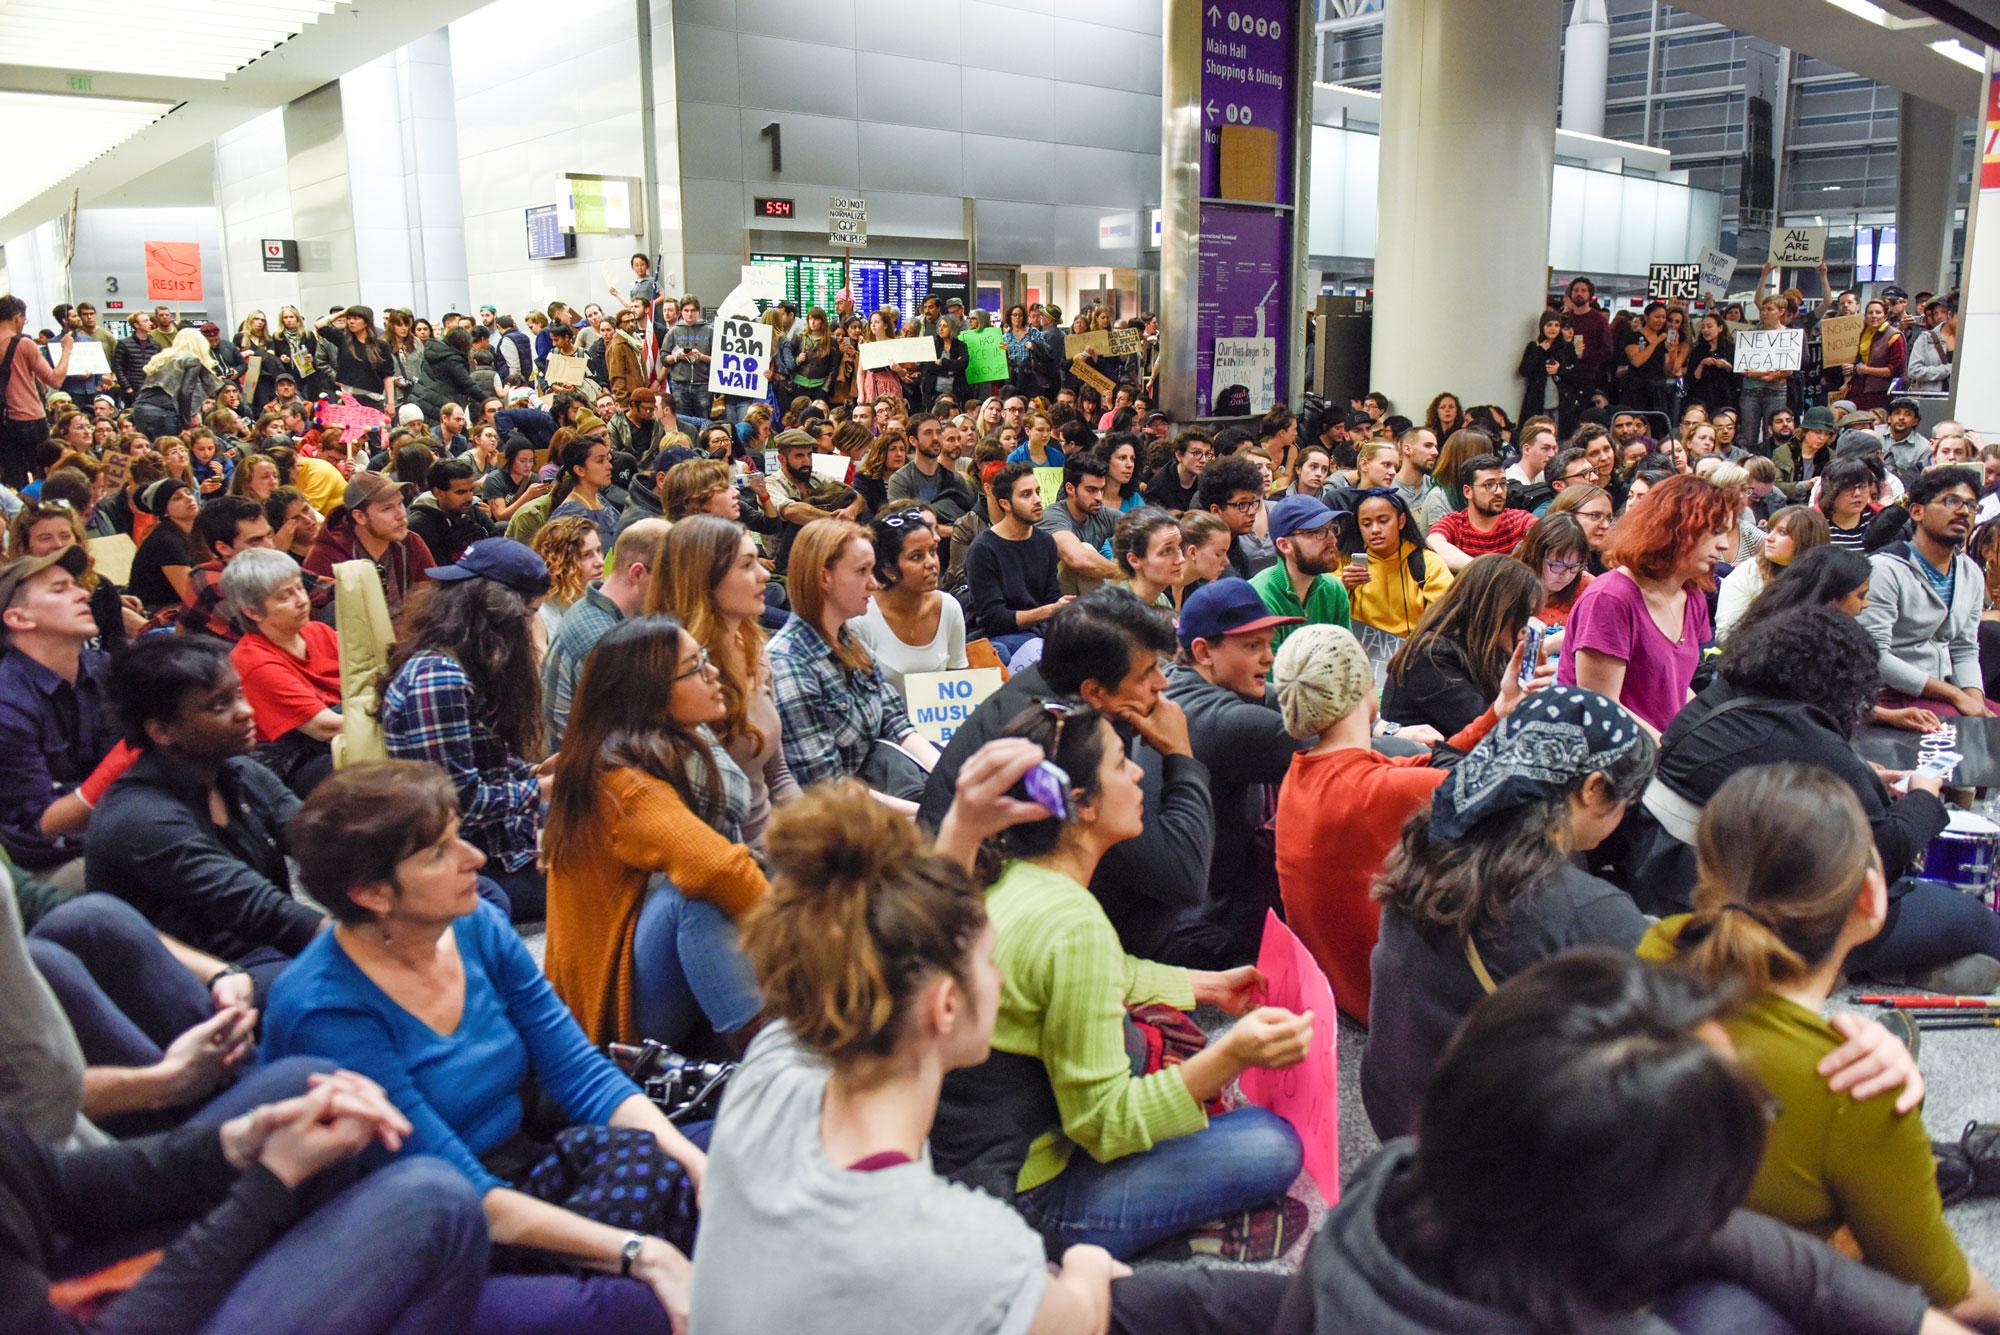 Demonstrators during anti-Donald Trump immigration ban protests in Terminal 4 at San Francisco International Airport.